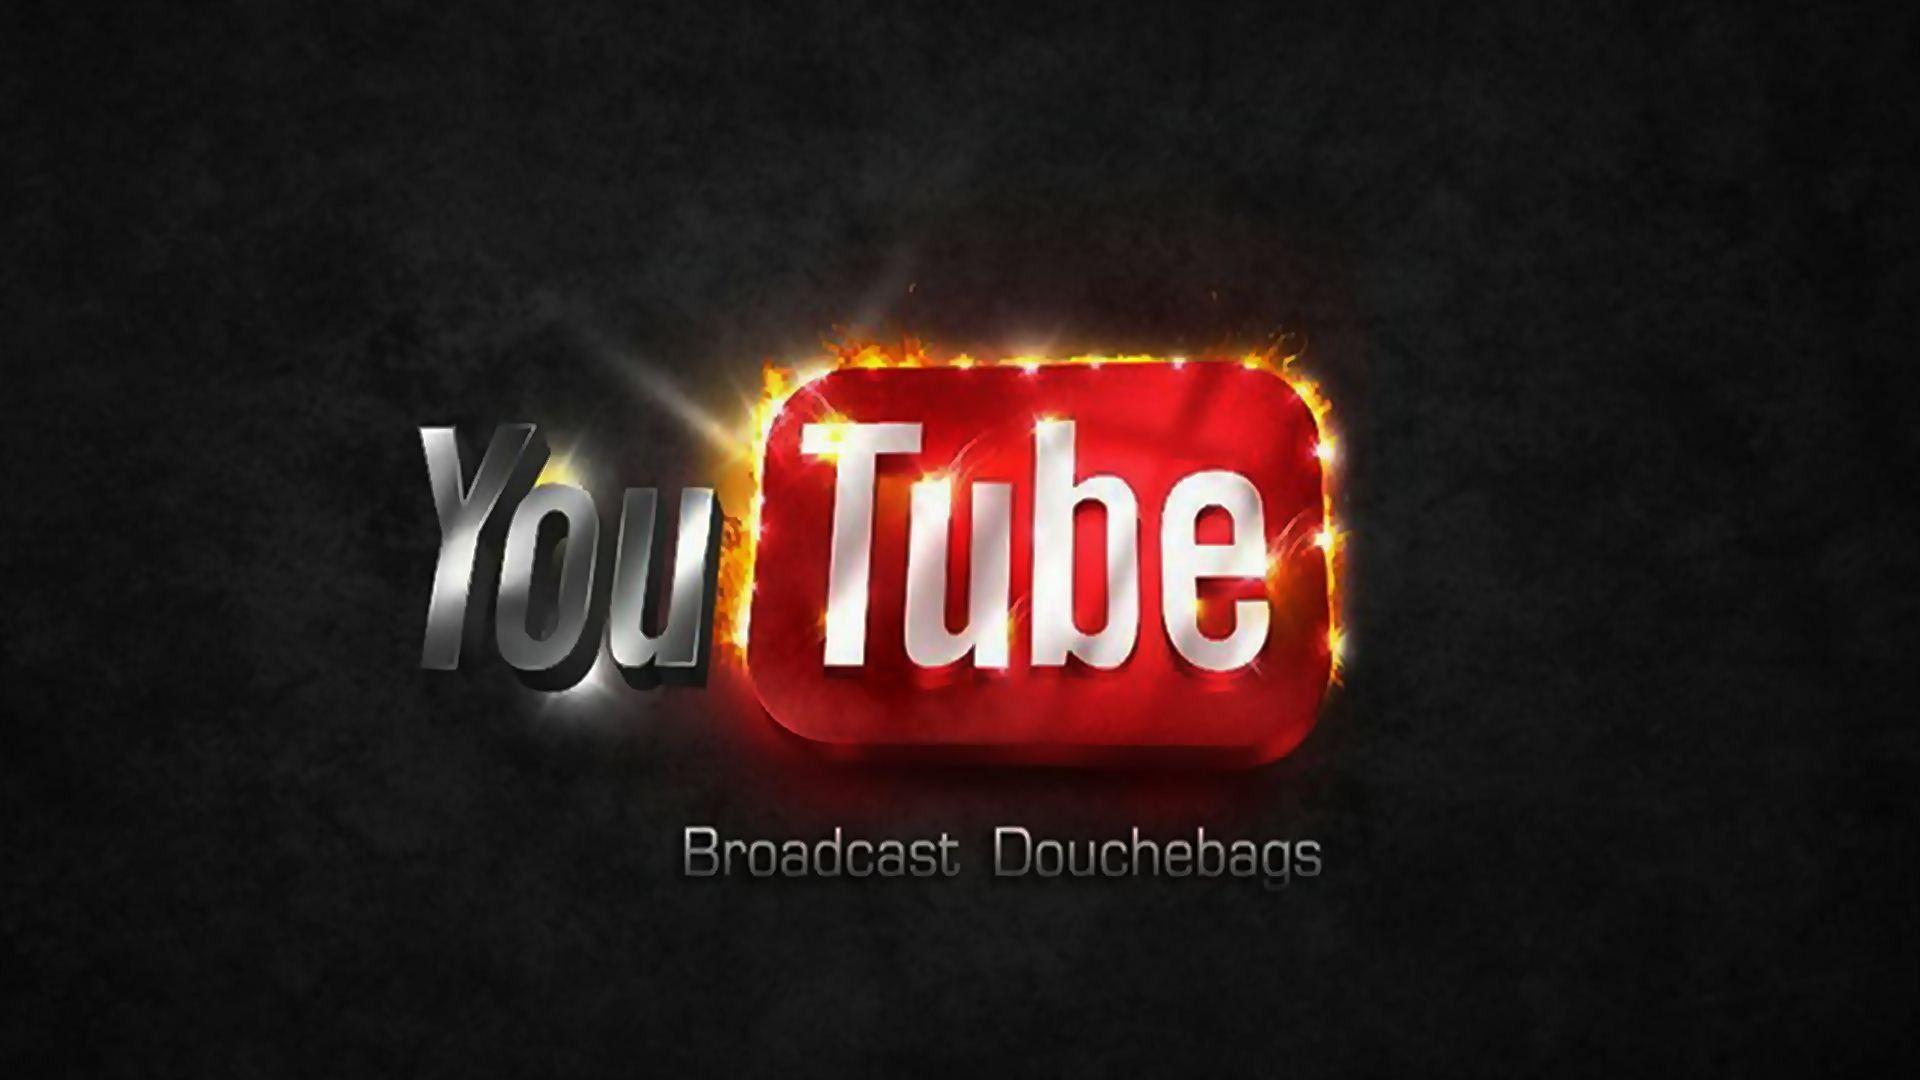 youtube logo hd